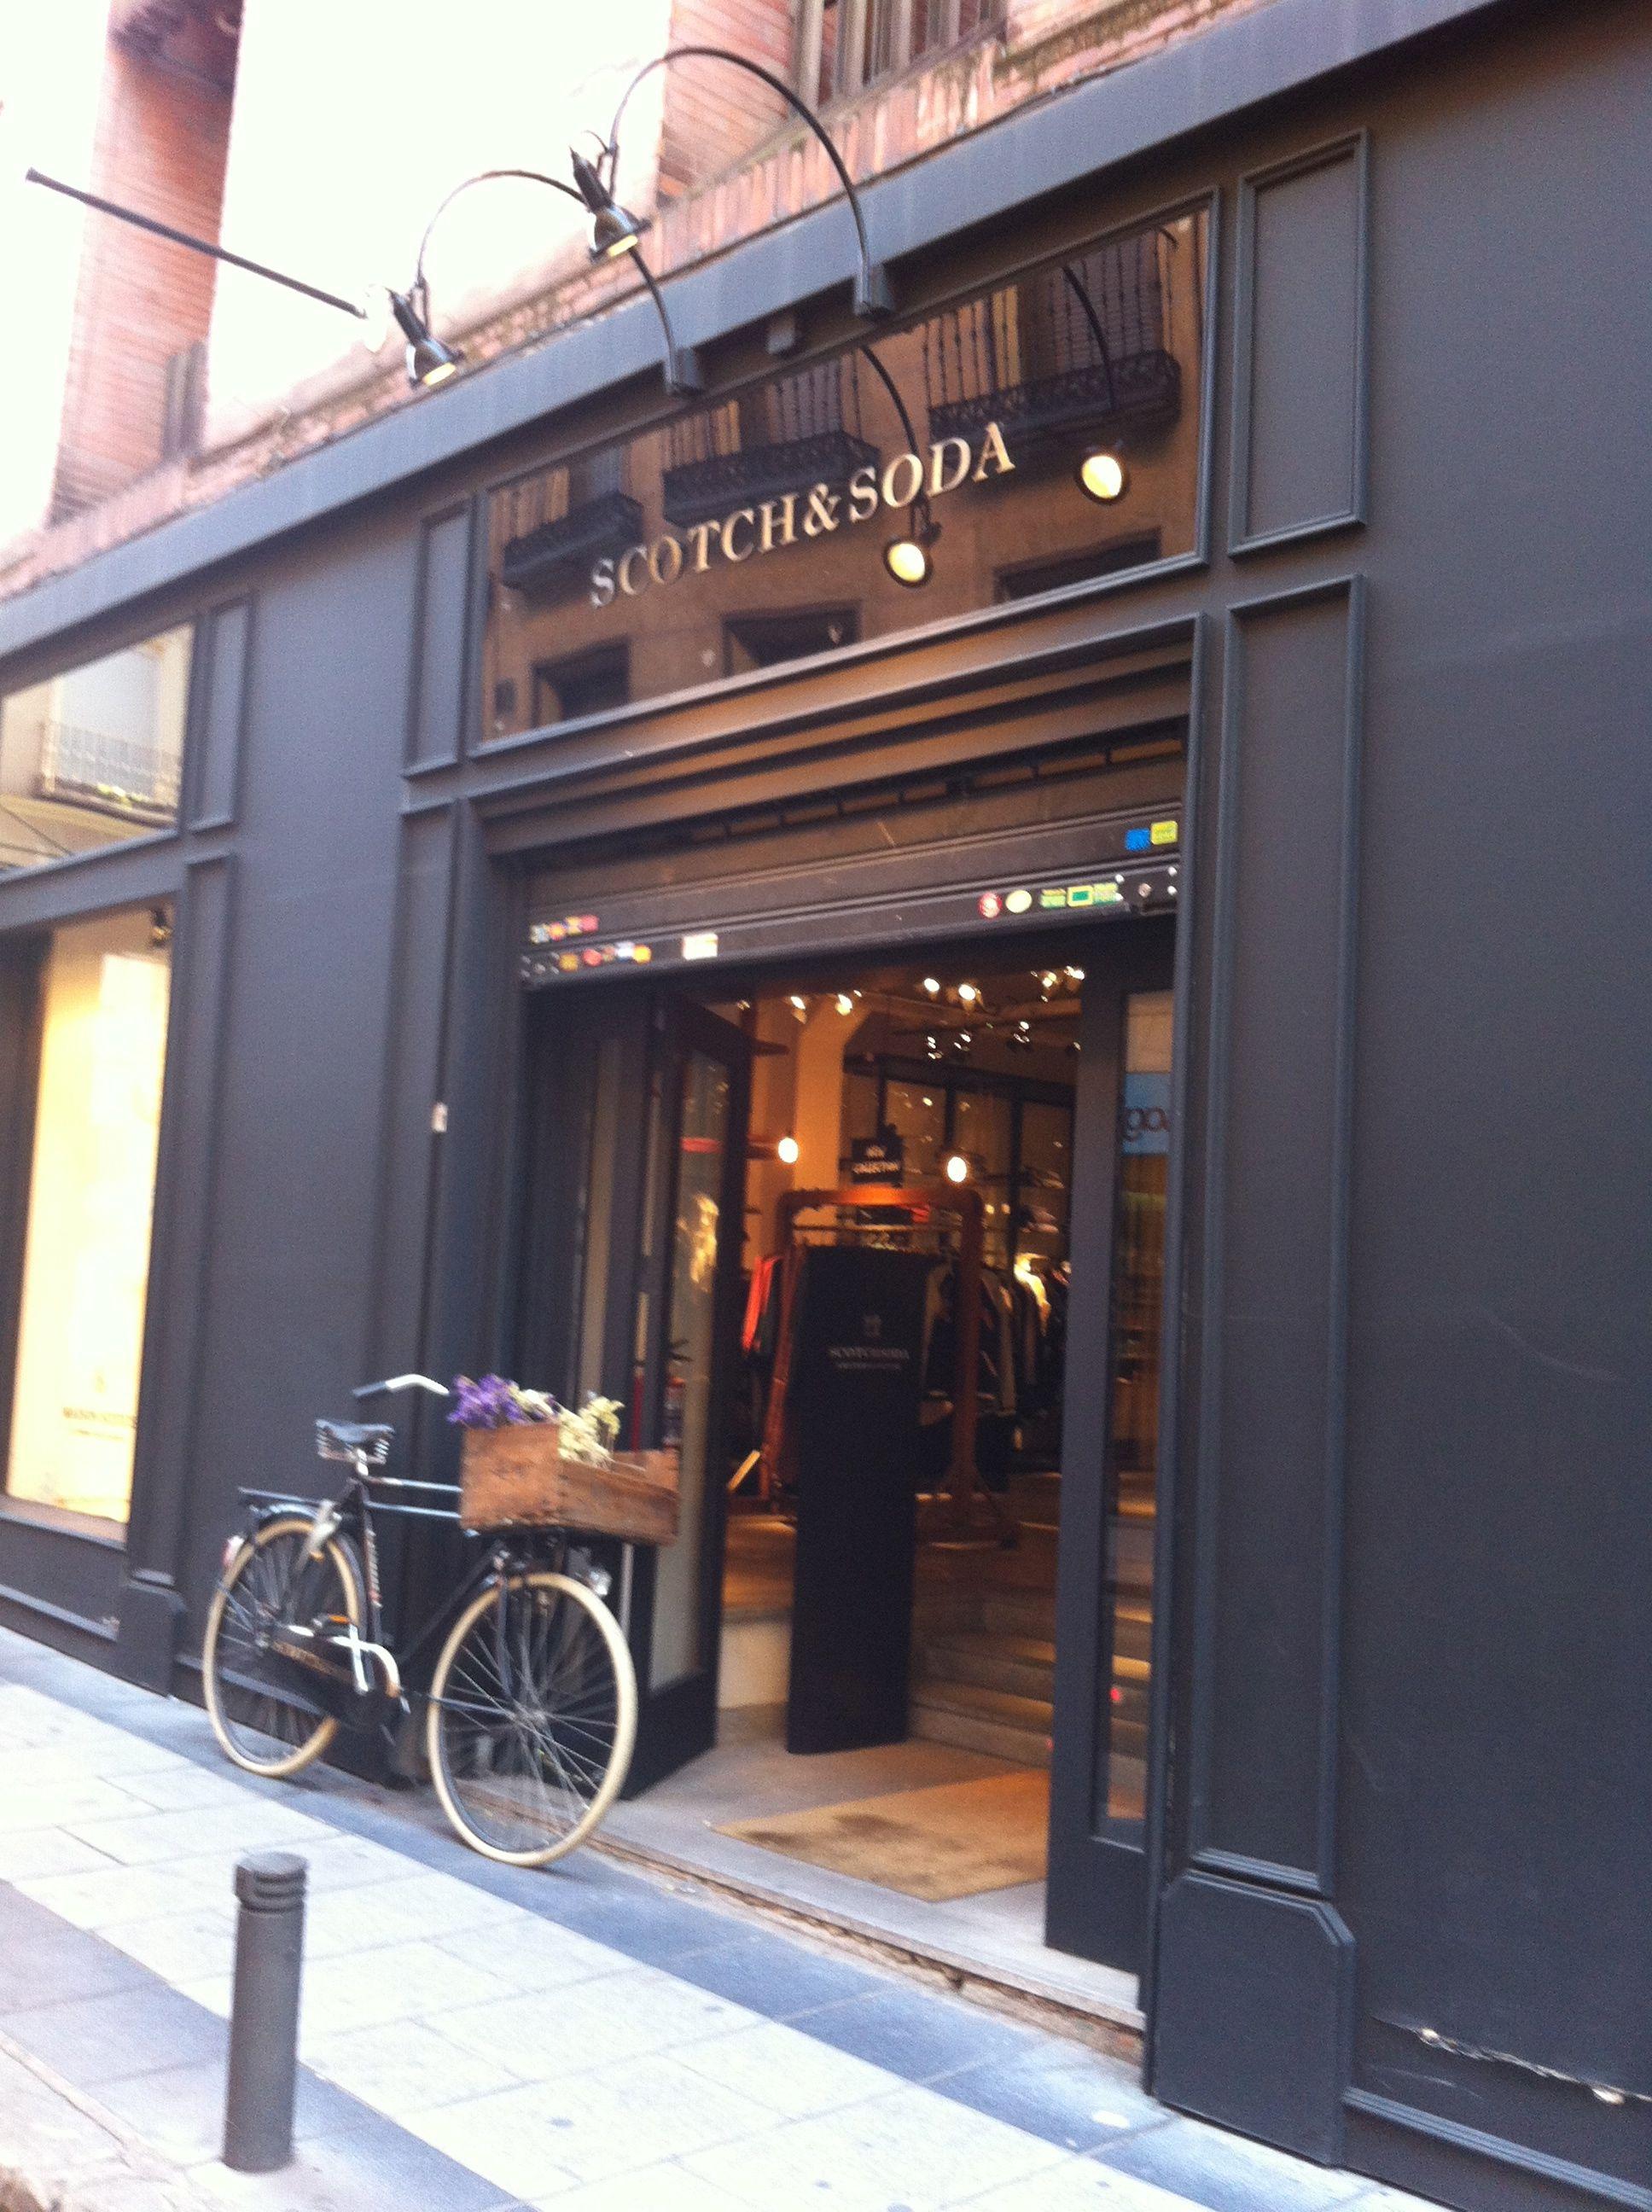 Tiendas Chic  Blog de Moda a precios econmicos